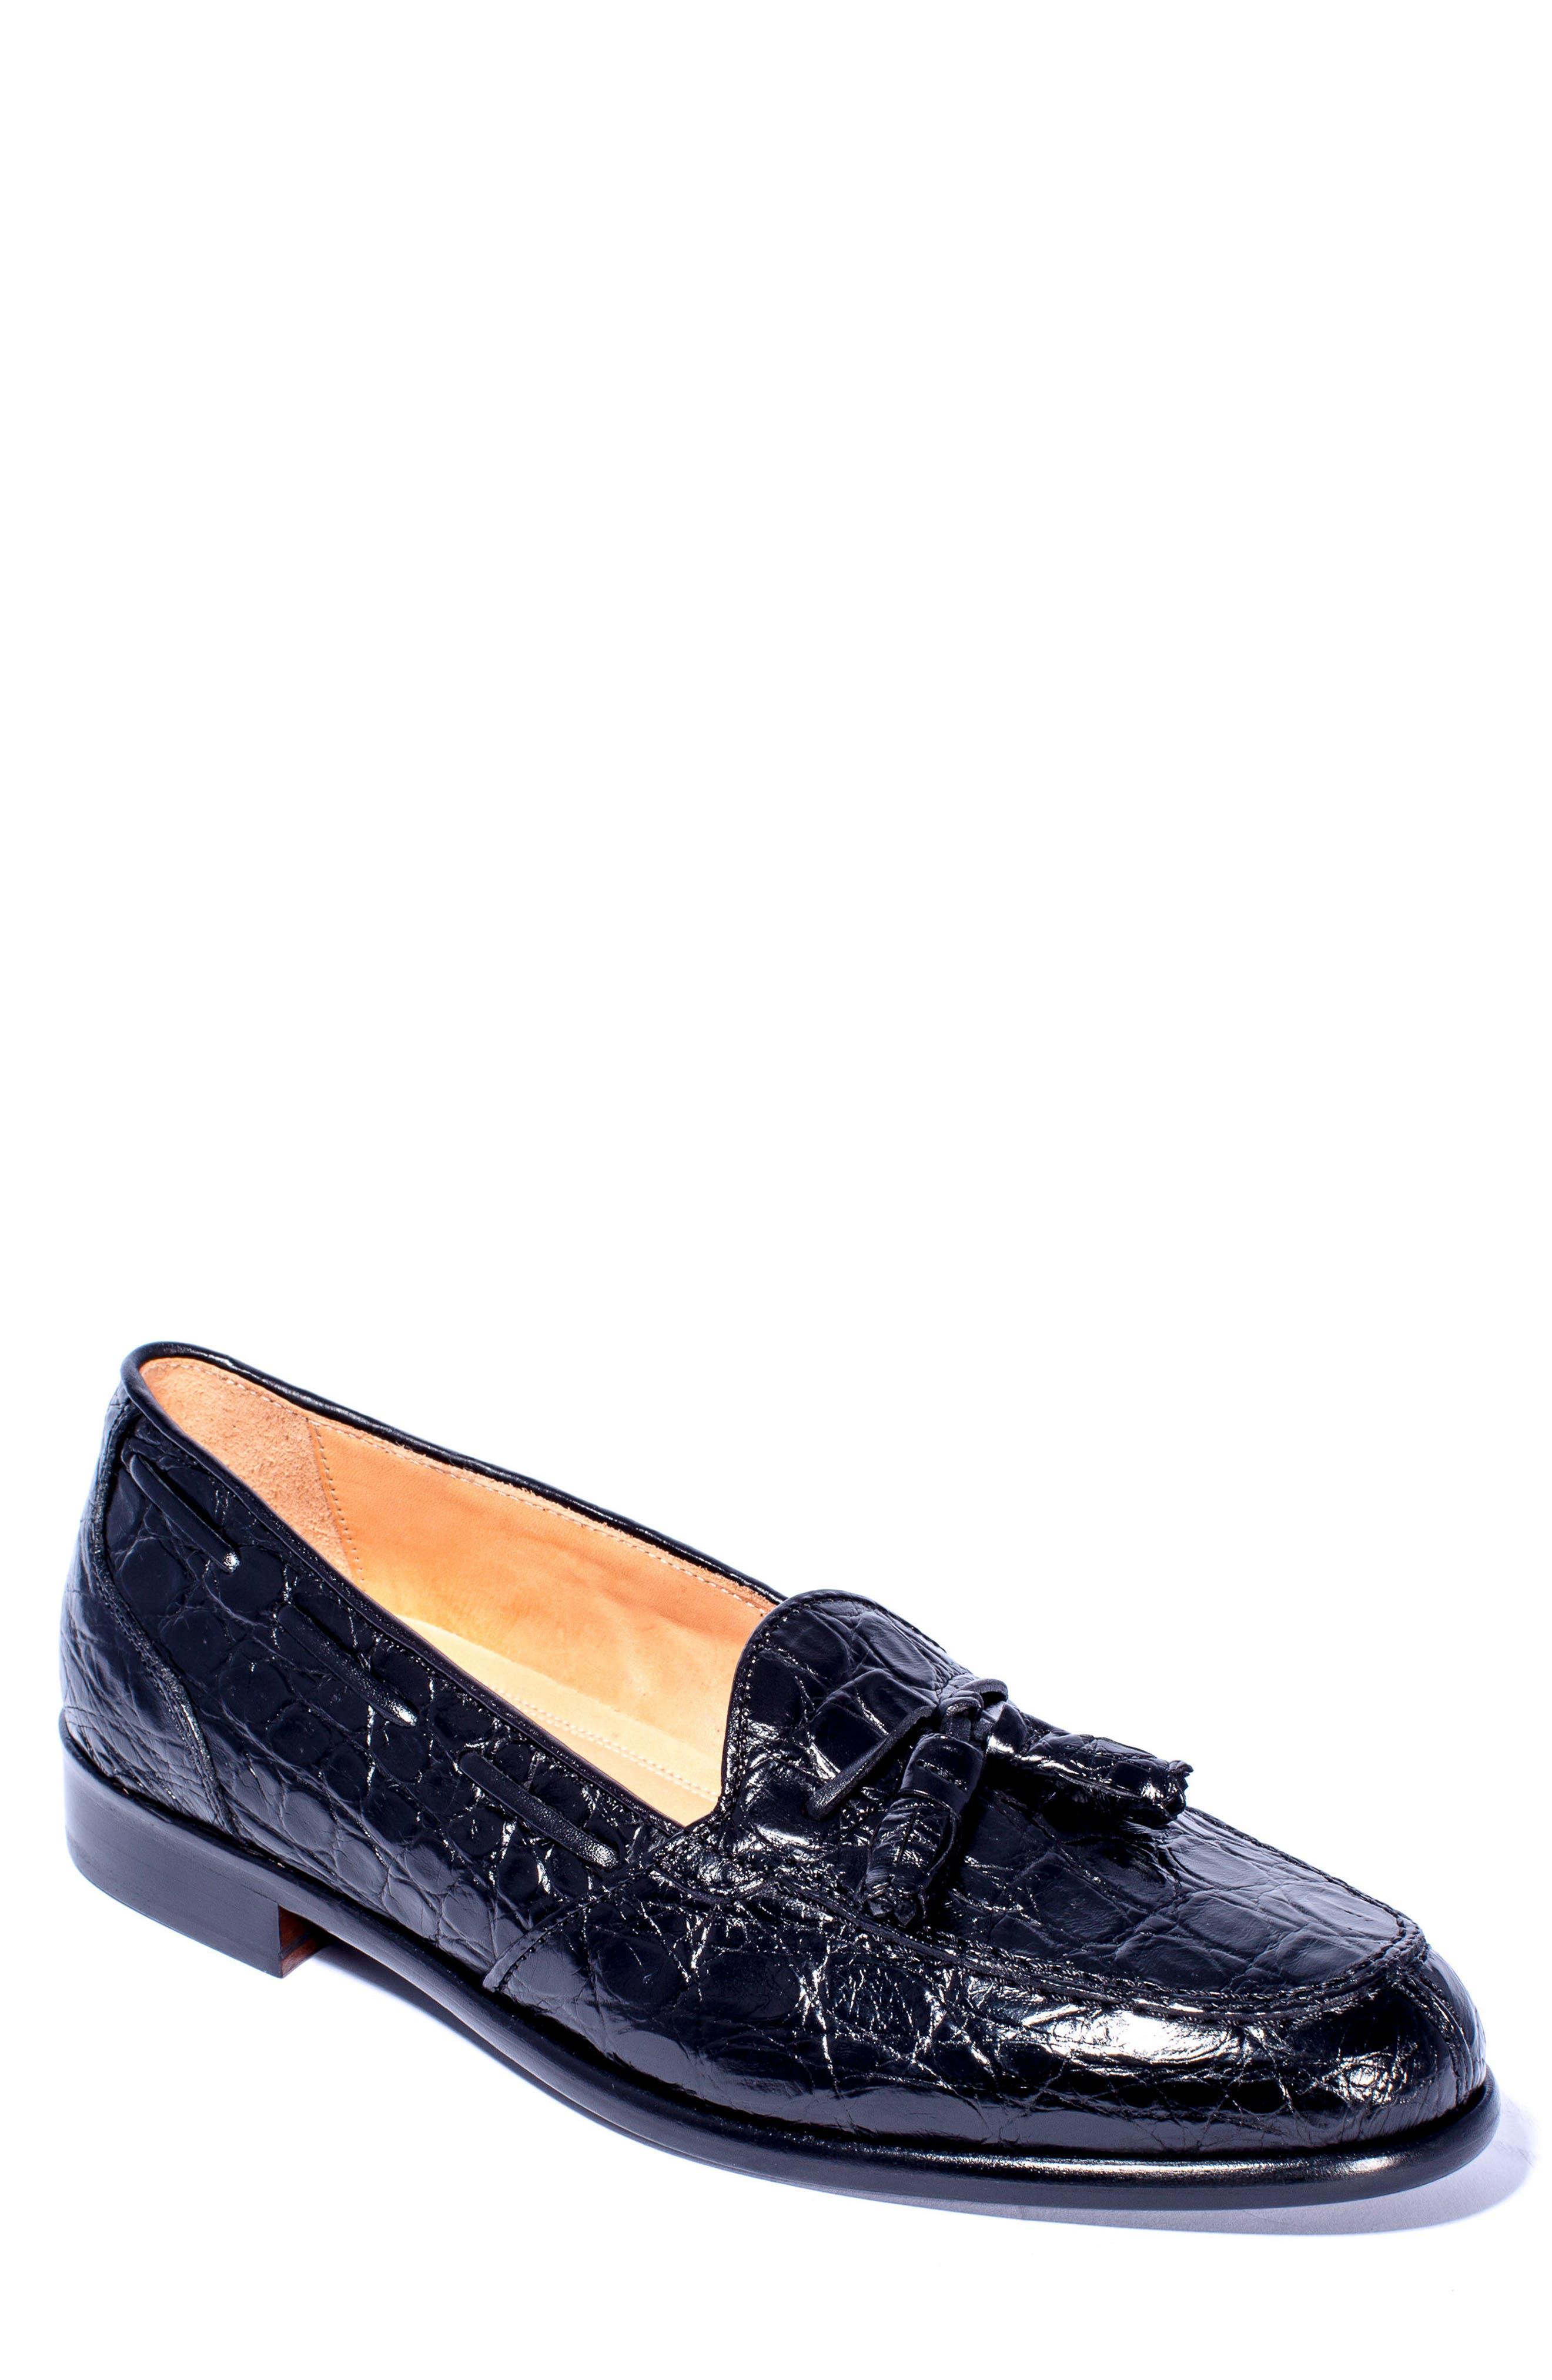 Franco Tassel Exotic Leather Loafer,                         Main,                         color,